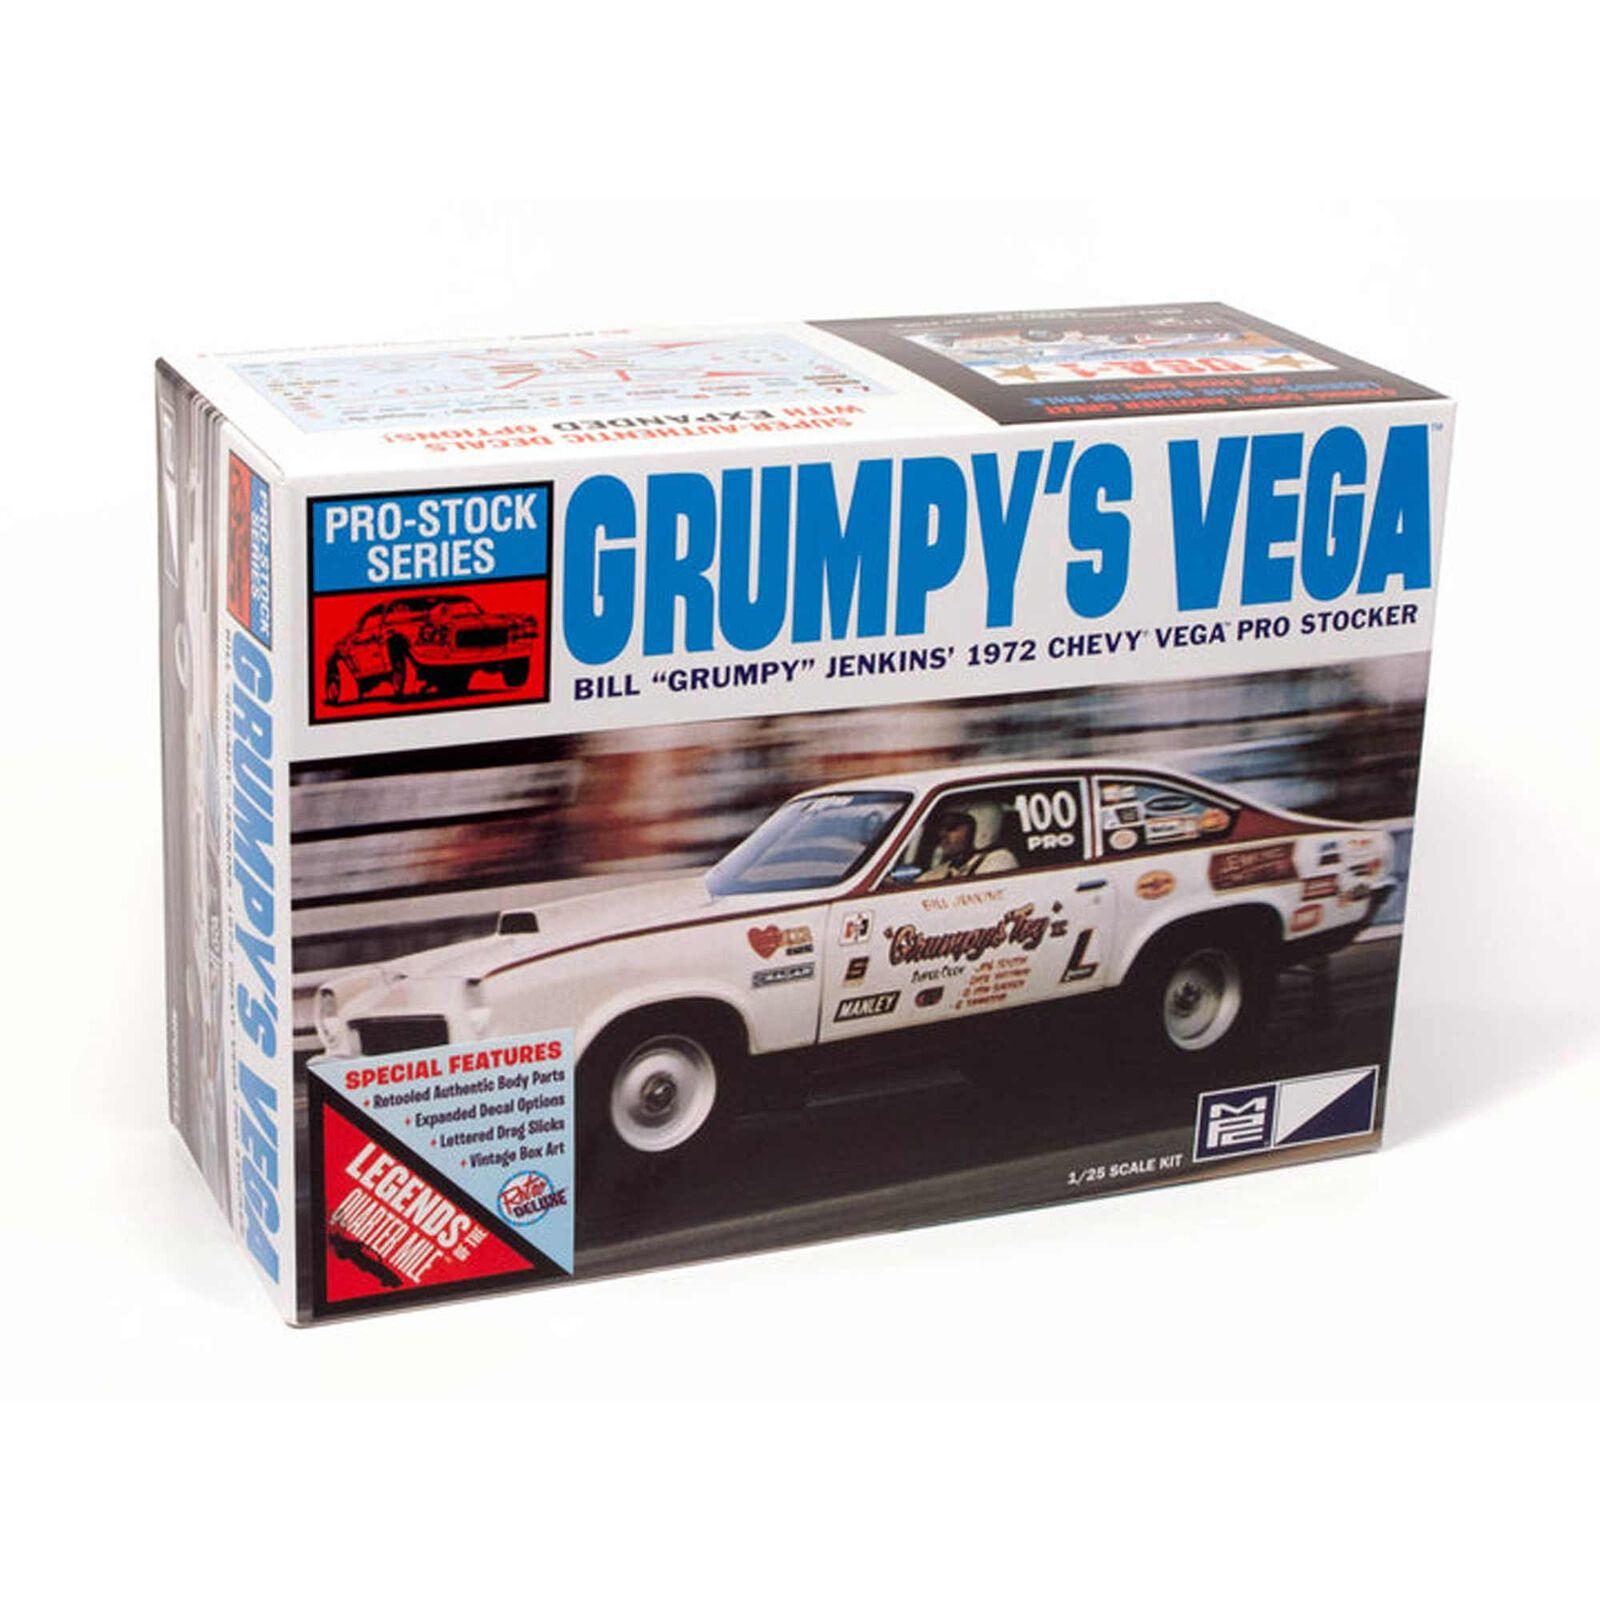 1/25 1972 Chevy Vega Pro Stock, Bill Grumpy Jenkins